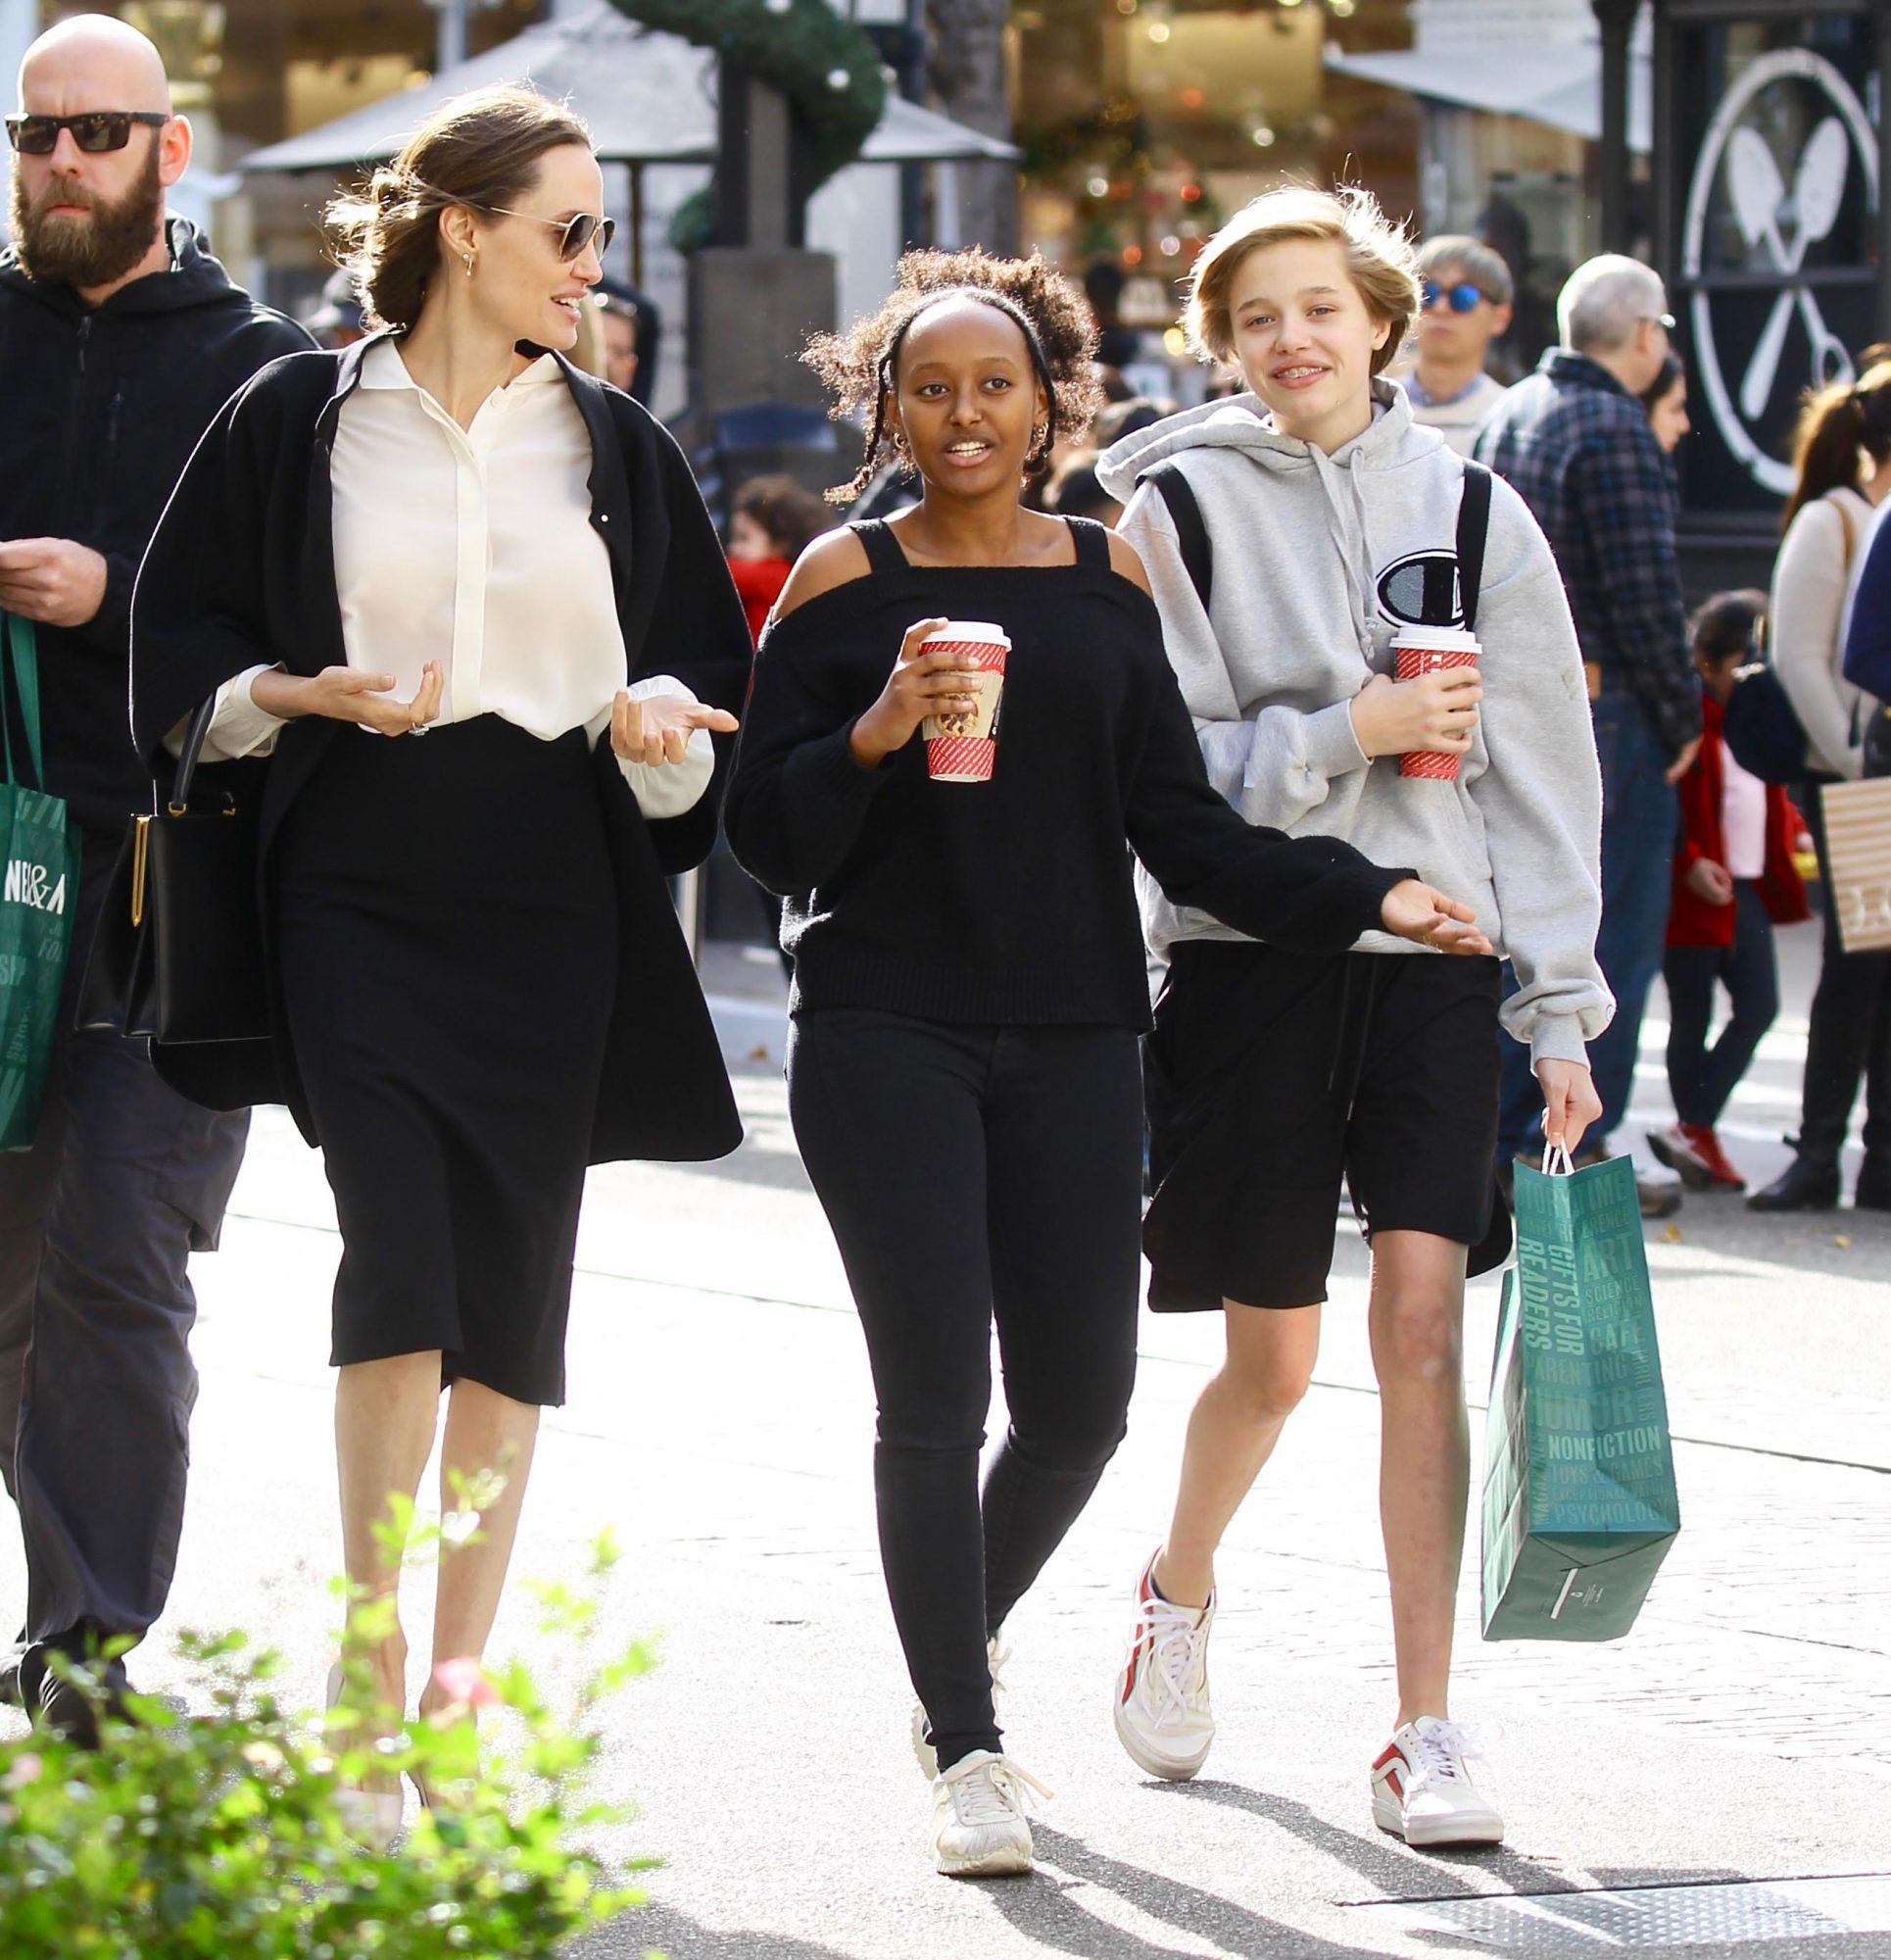 Angelina Jolie takes daughters Zahara and Shiloh